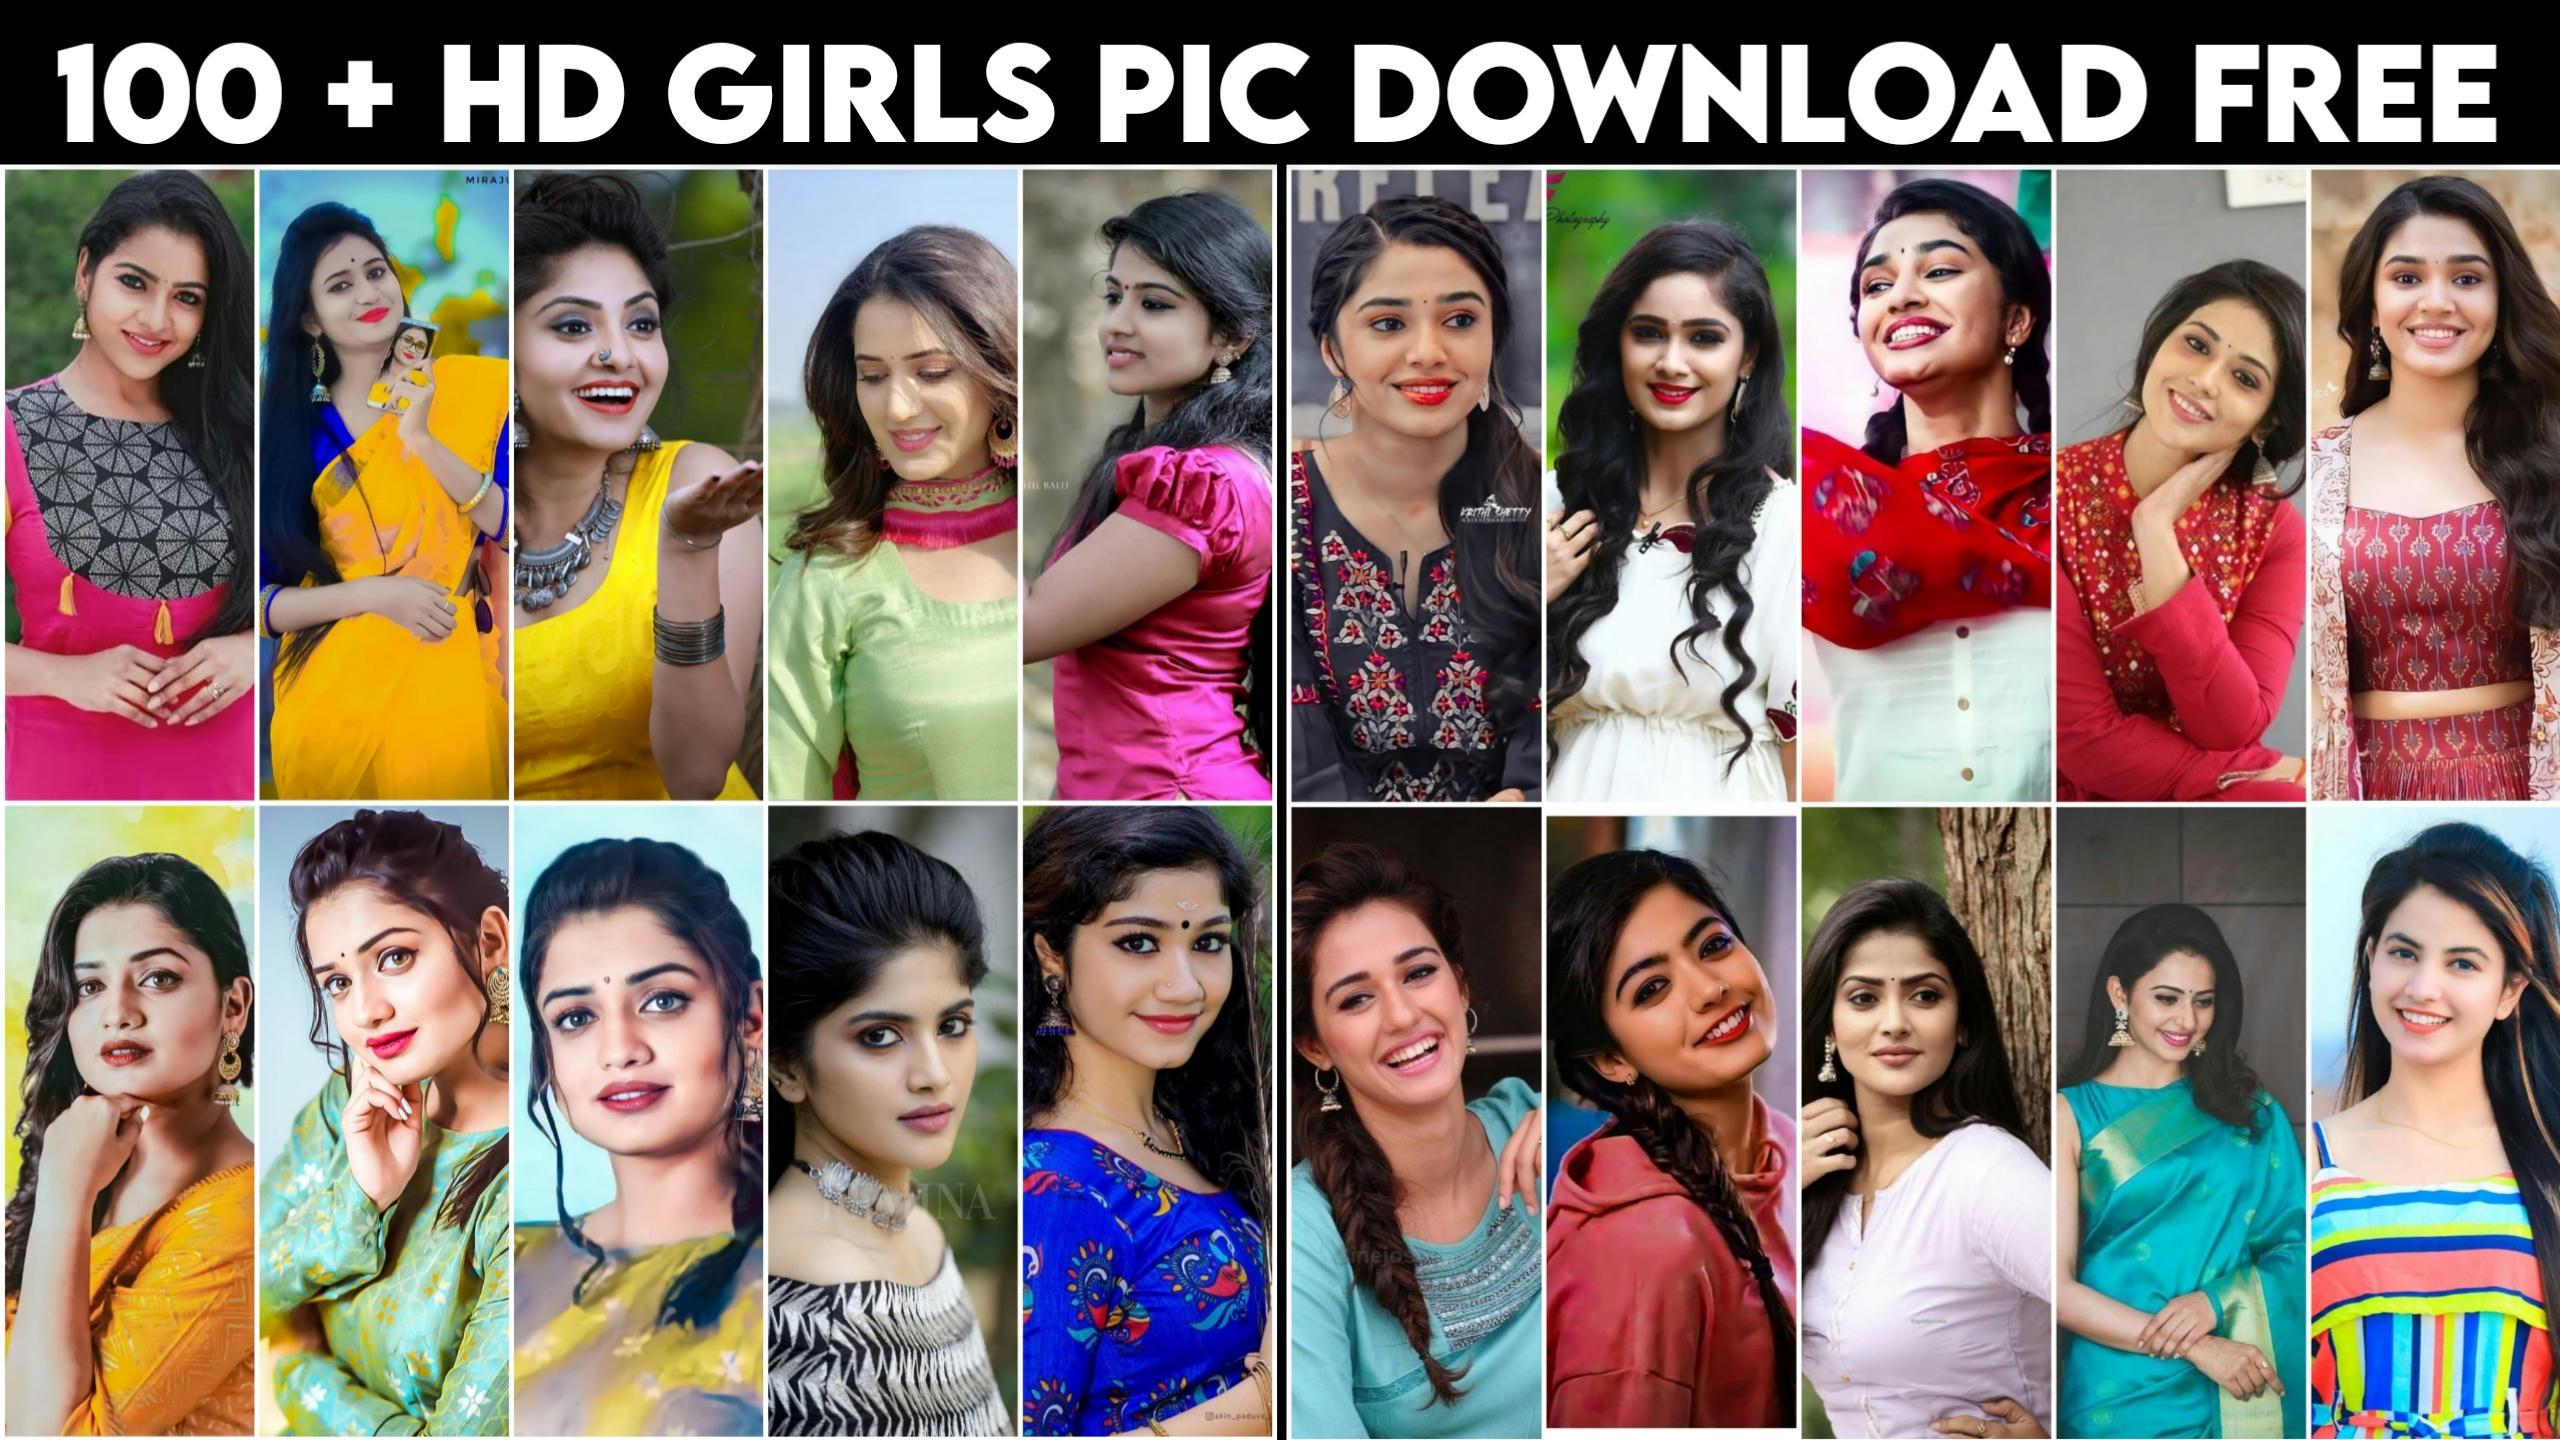 100 HD Girls Pic Use Avee Player And Kinemaster Editing By DjDevrajKasya